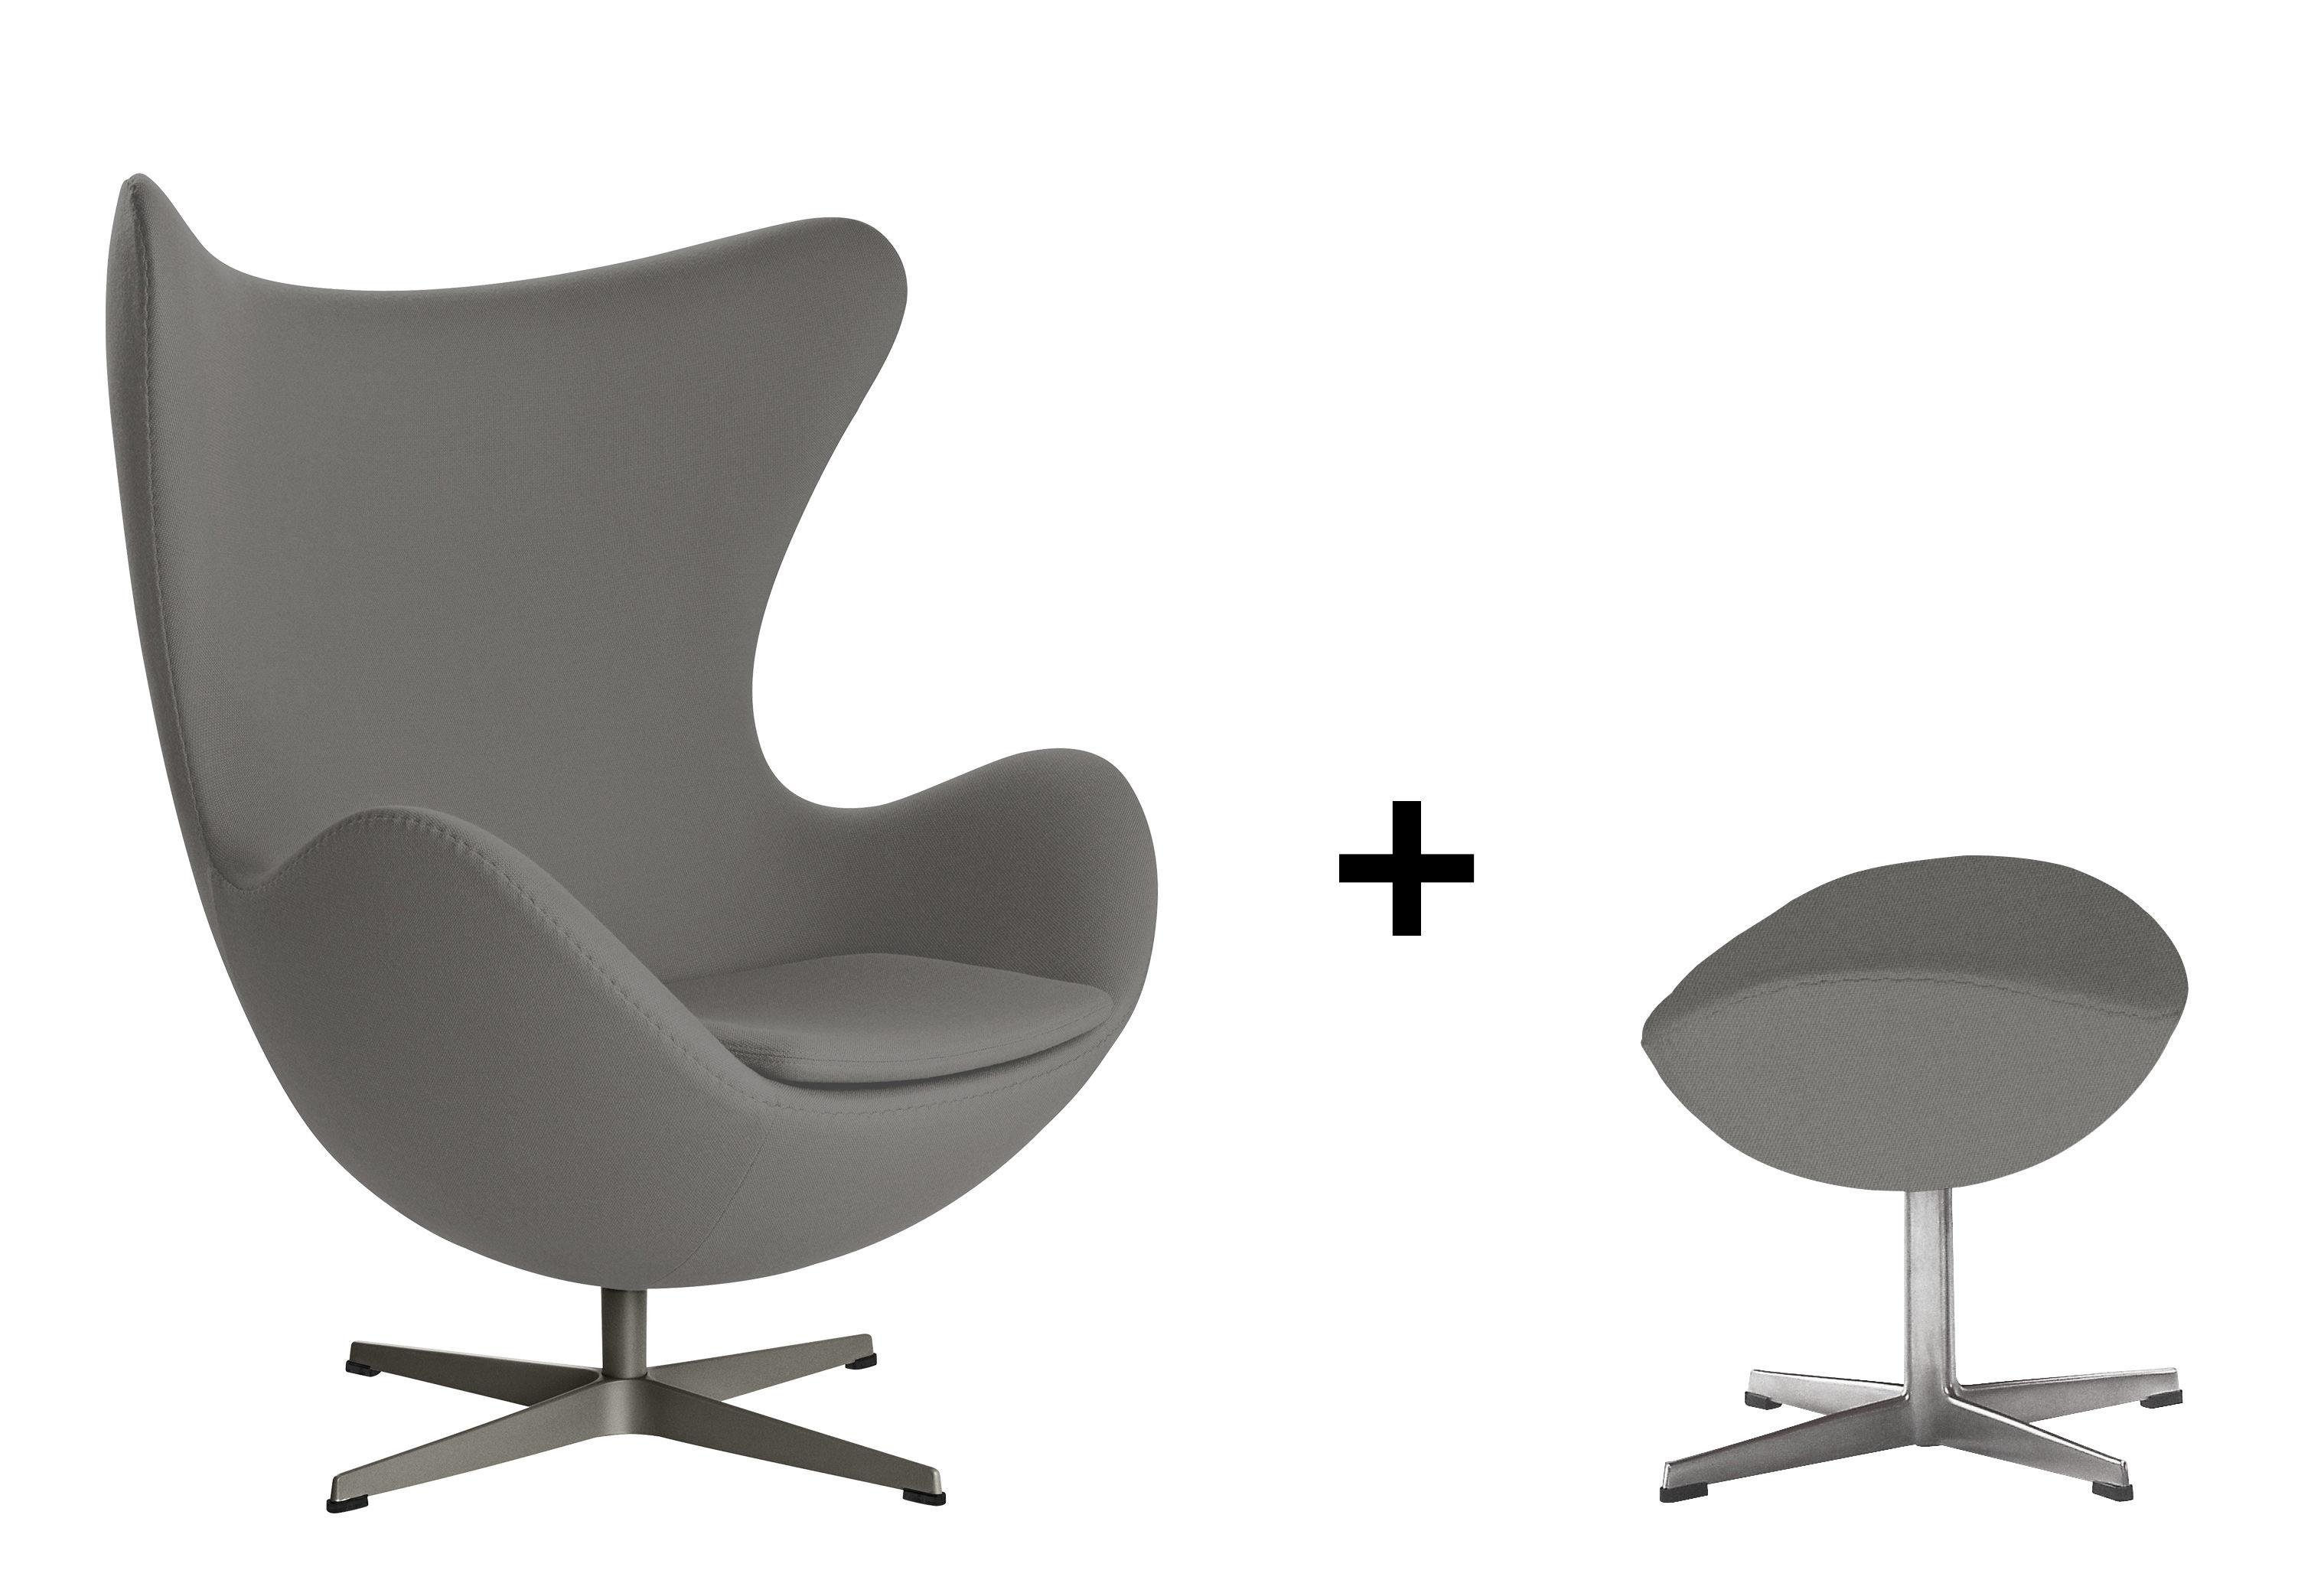 fauteuil pivotant egg chair tissu gabriele offert 1 repose pieds gris fonc fritz hansen. Black Bedroom Furniture Sets. Home Design Ideas